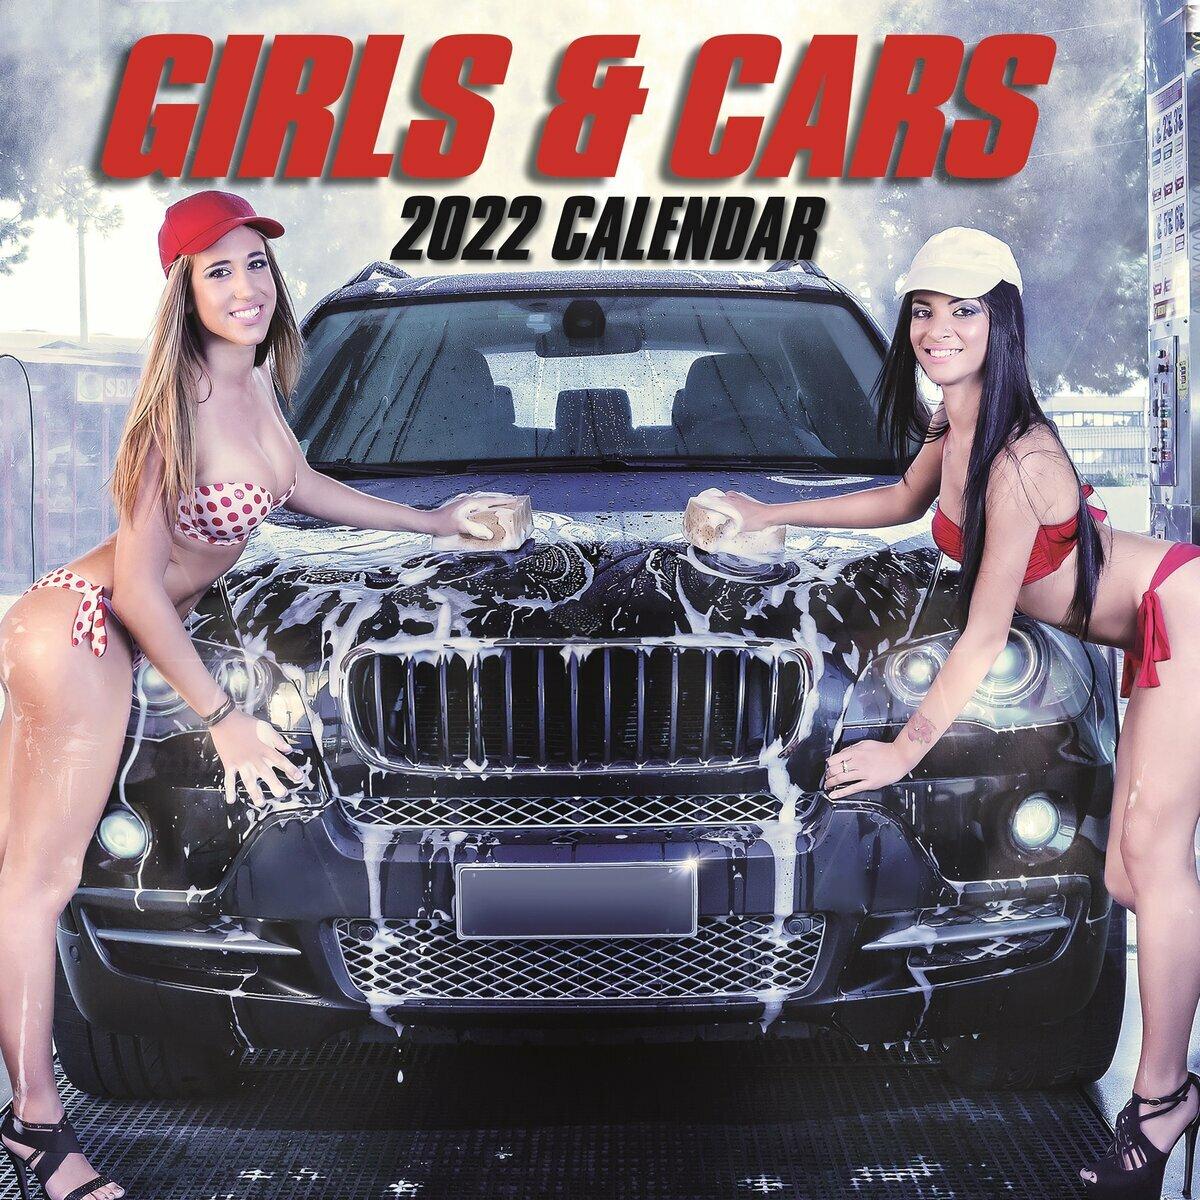 Calendrier 2022 Hot Femme Calendrier 2022 Sexy femme et voiture